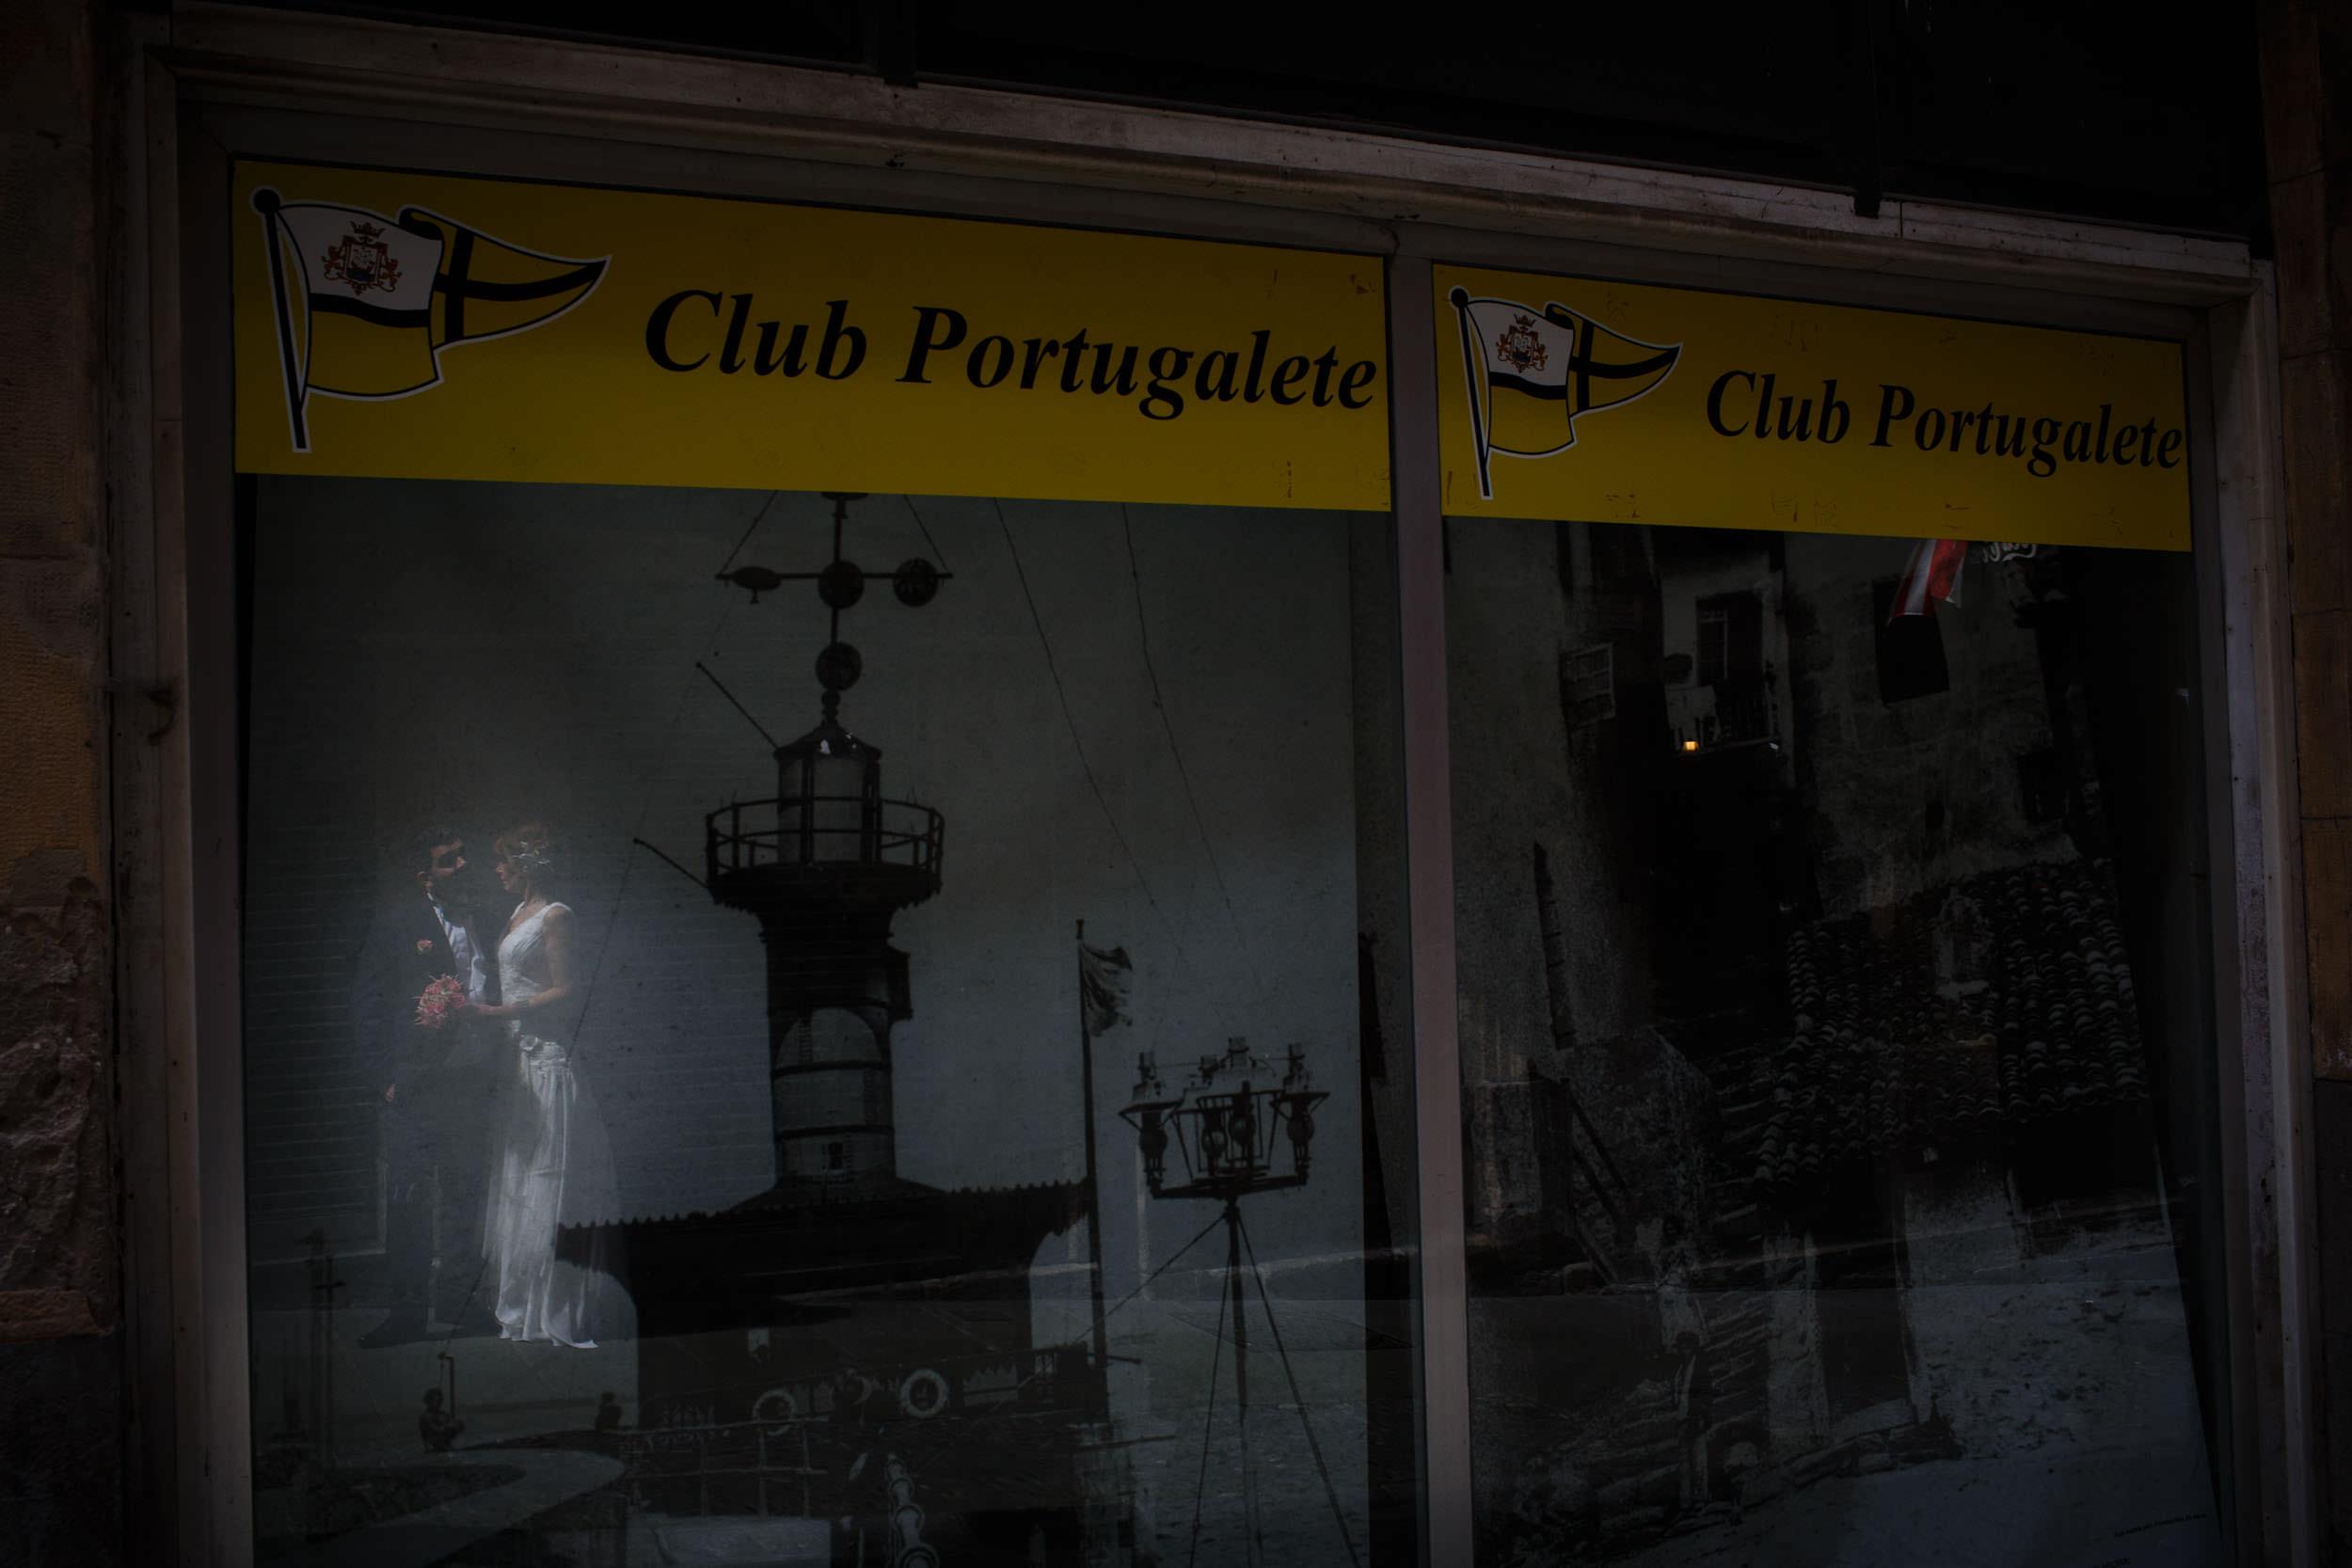 Fotografia Pre-Boda en Portugalete, Basque Country, Spain - James Sturcke  Photographer | sturcke.org_009.jpg